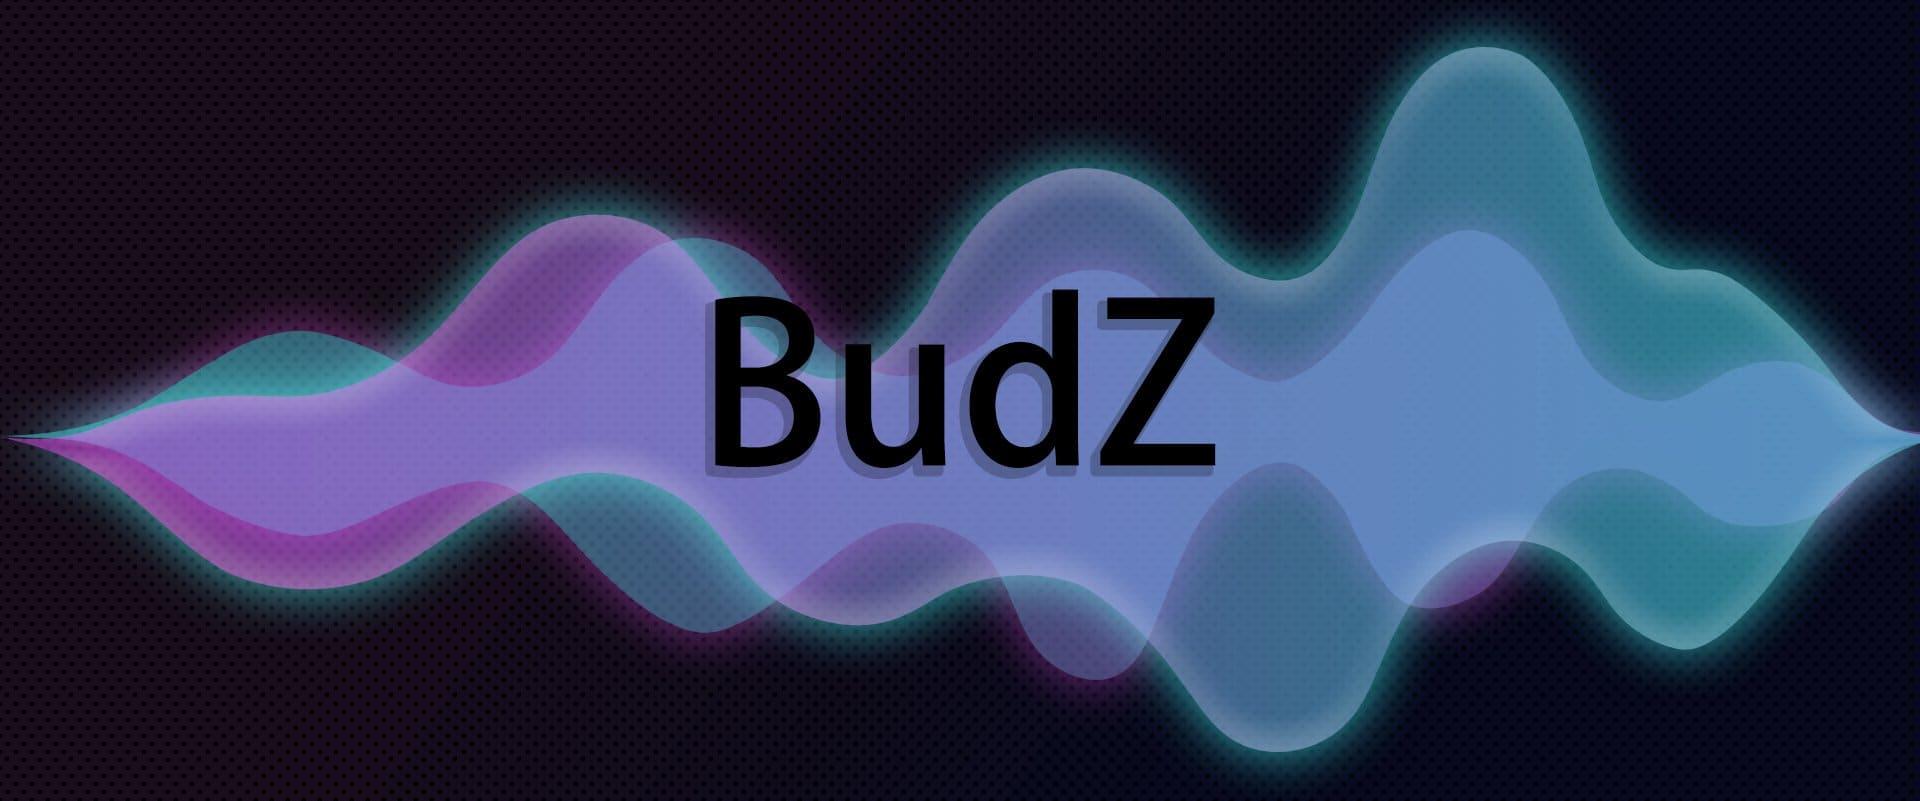 auriculares-OnPlus-BudsZ-banner-filtrdo